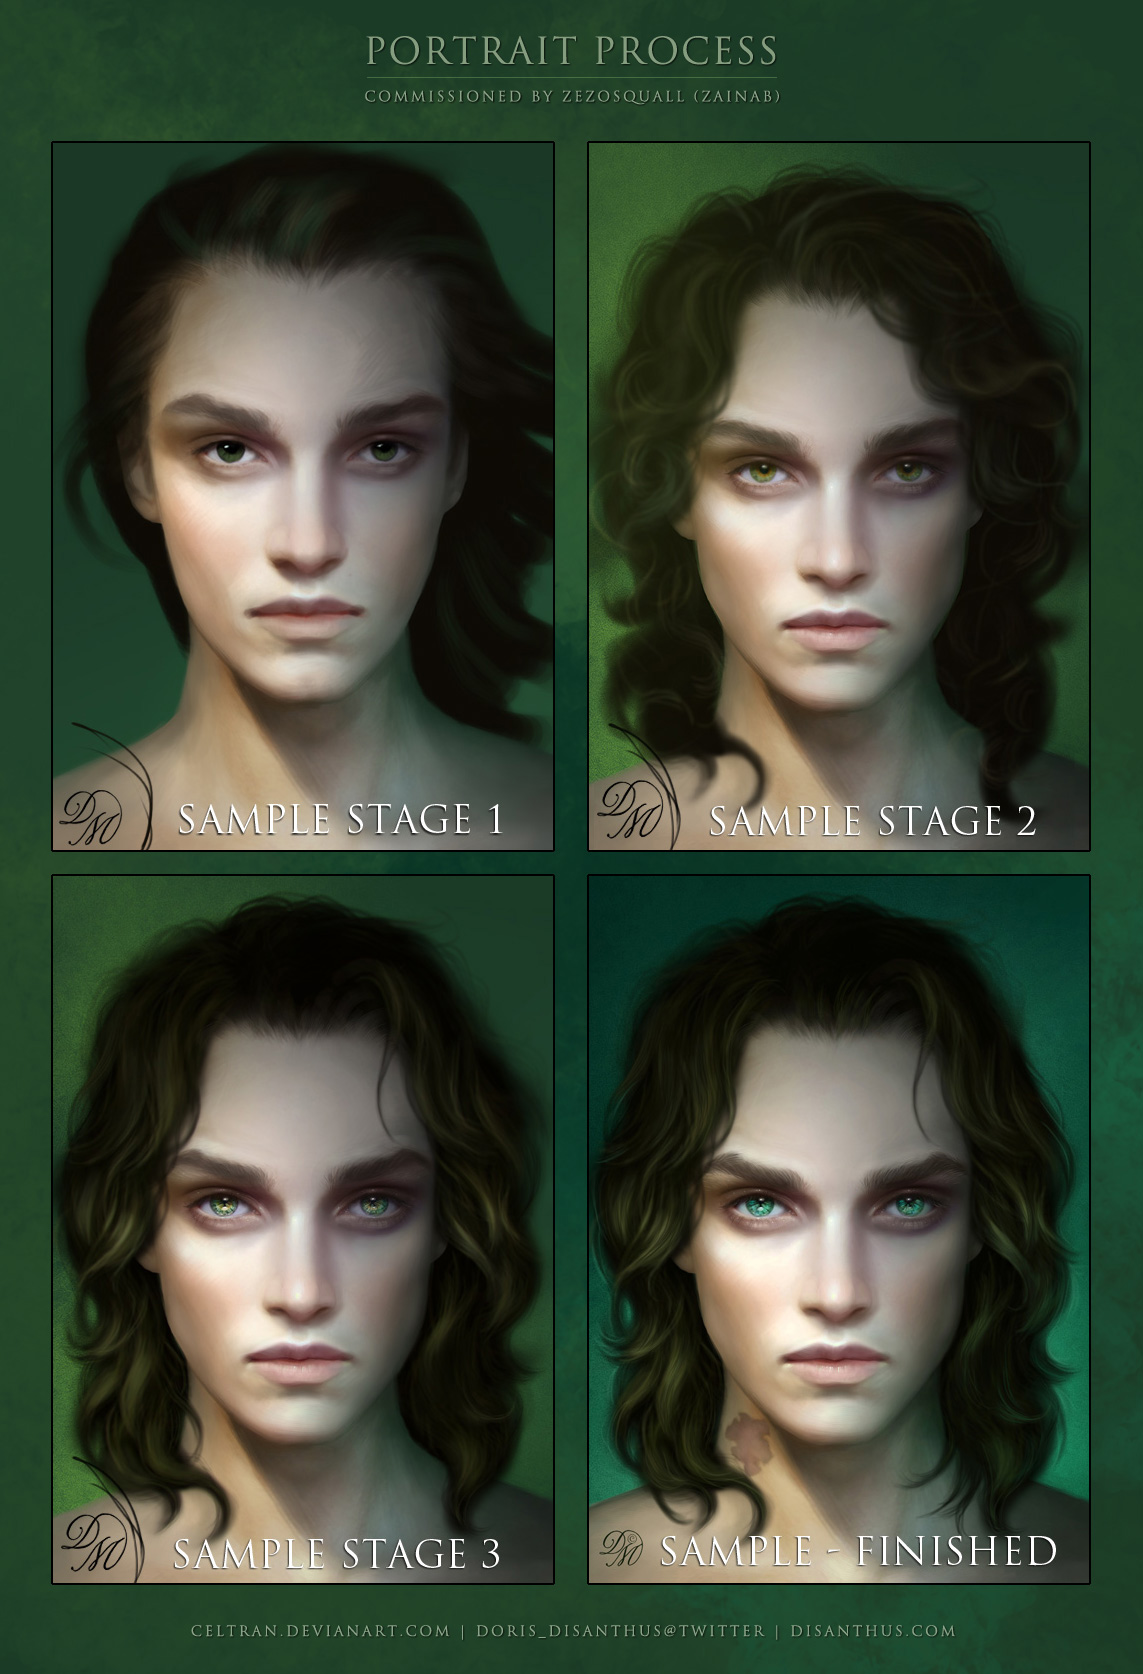 Squall Scardo: Process by Celtran